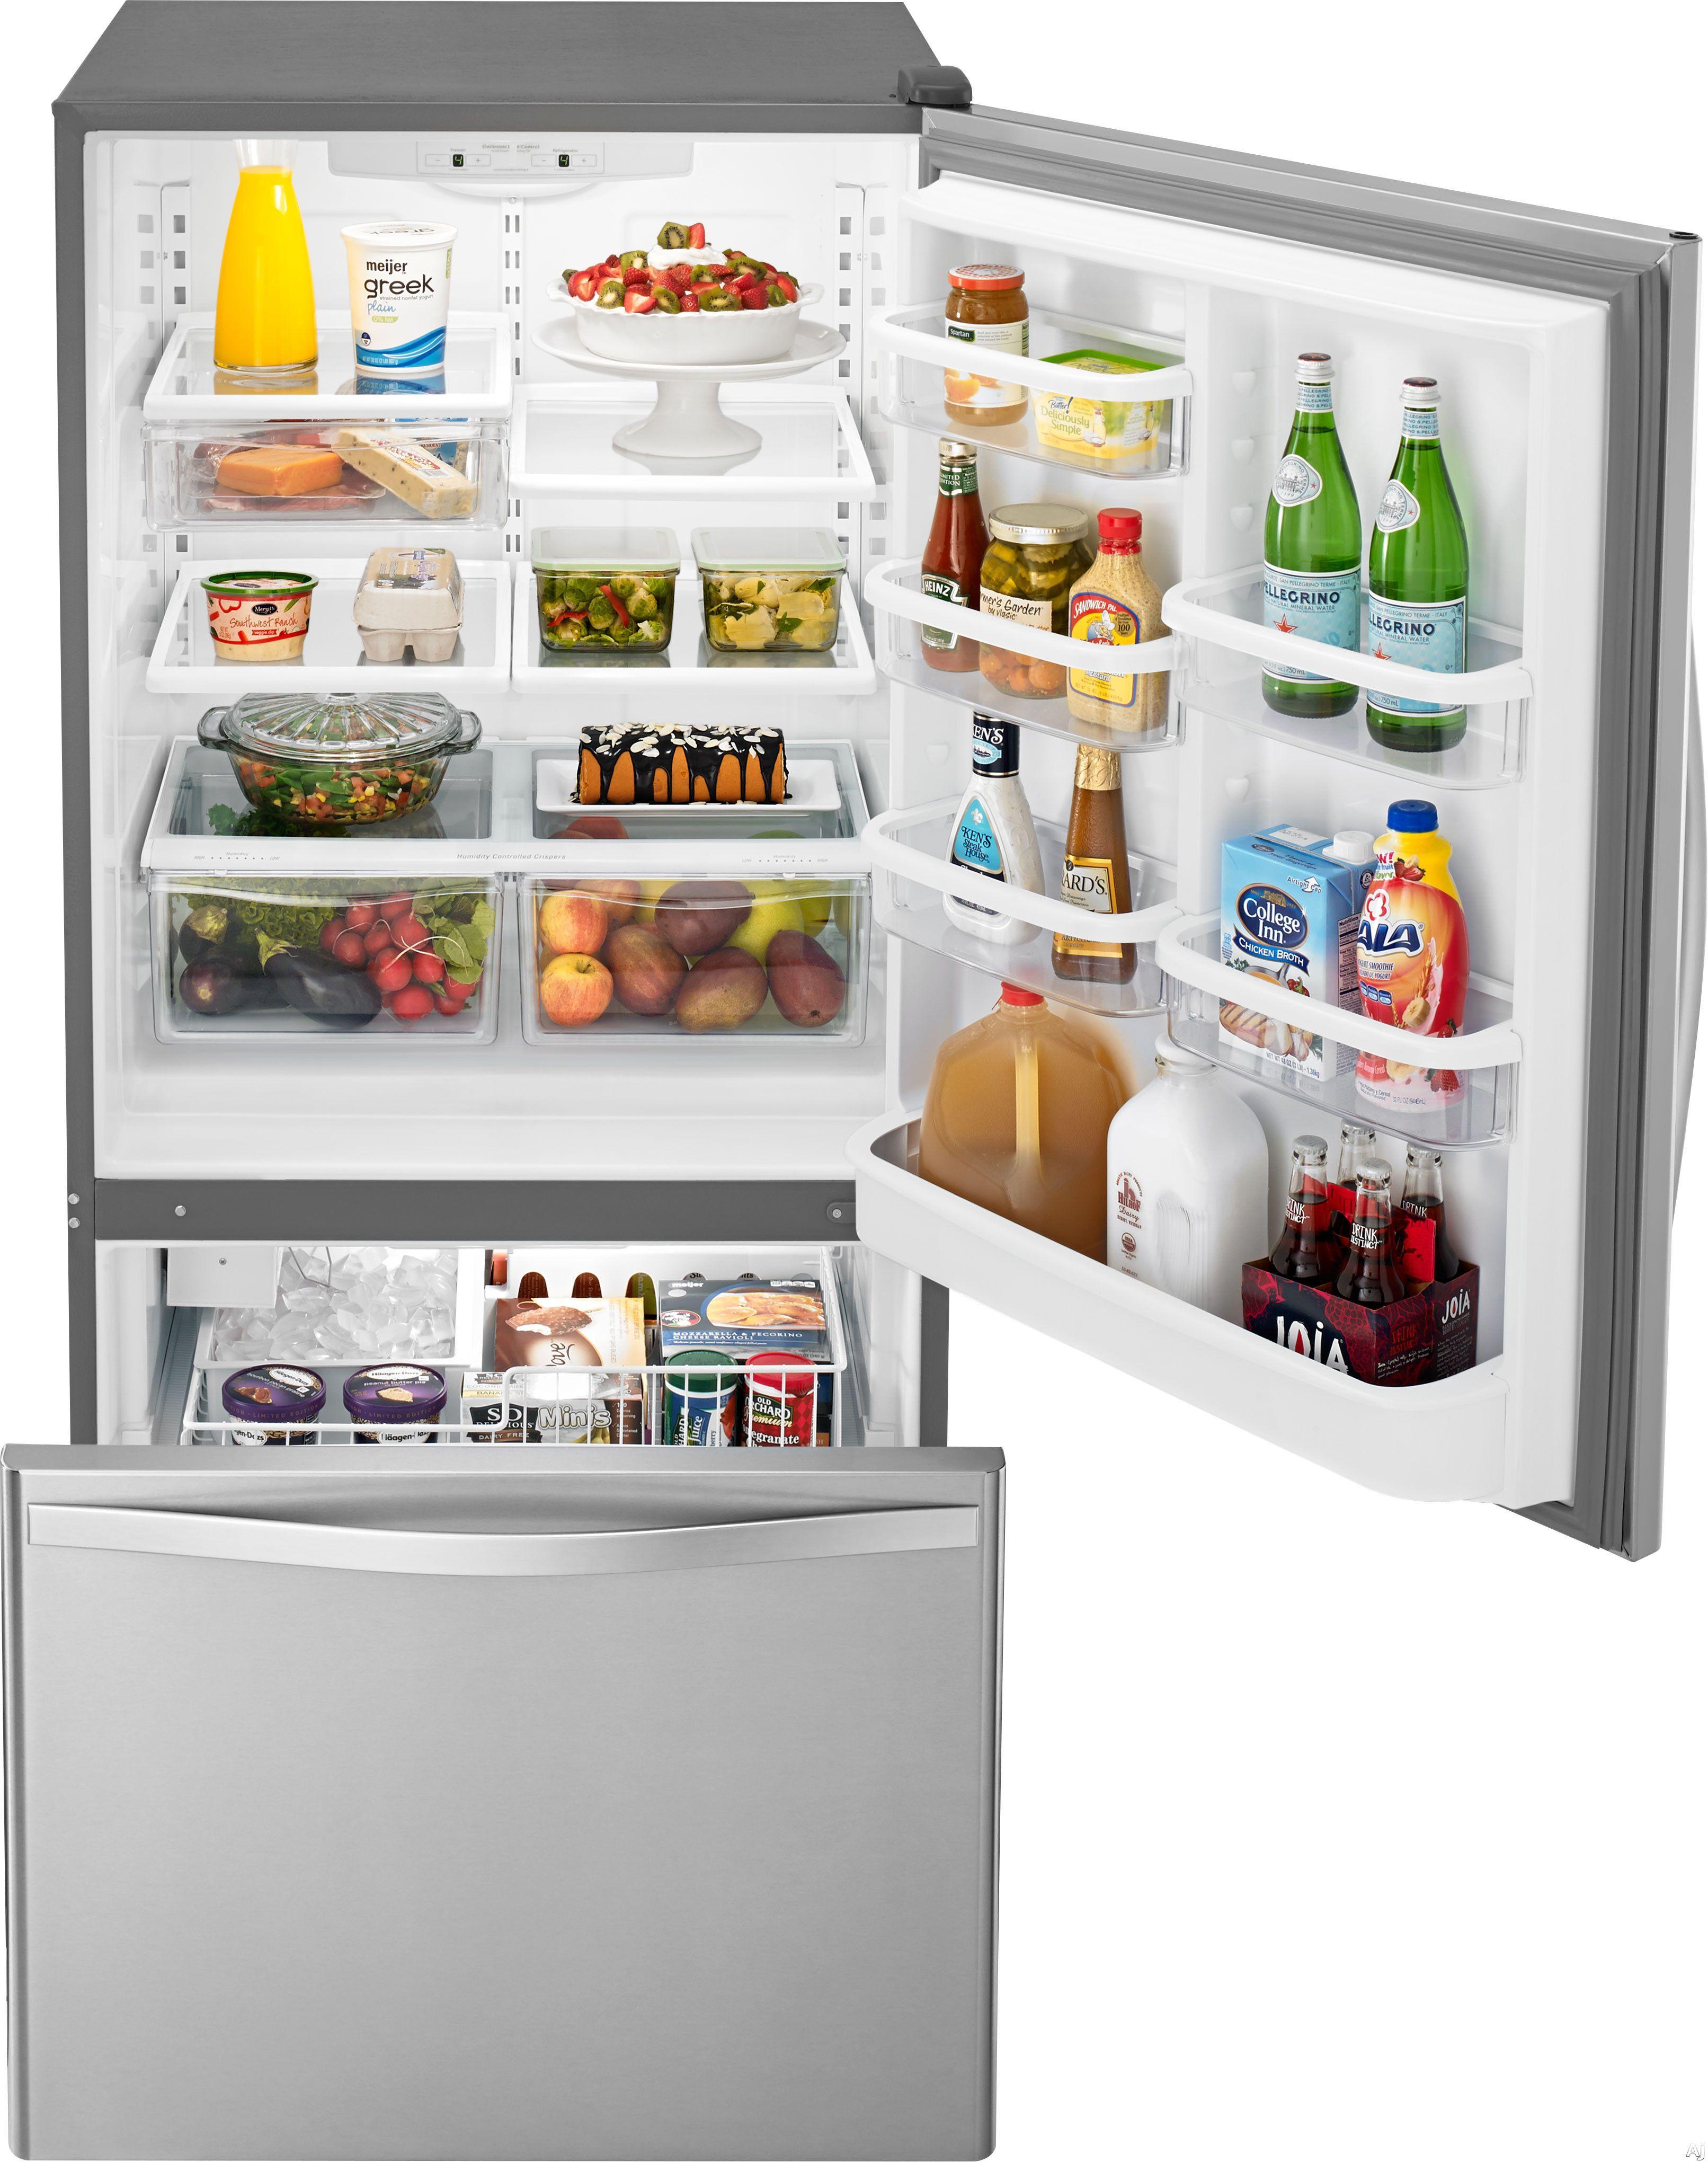 Whirlpool WRB322DMBM 21 9 cu ft Bottom Freezer Refrigerator with